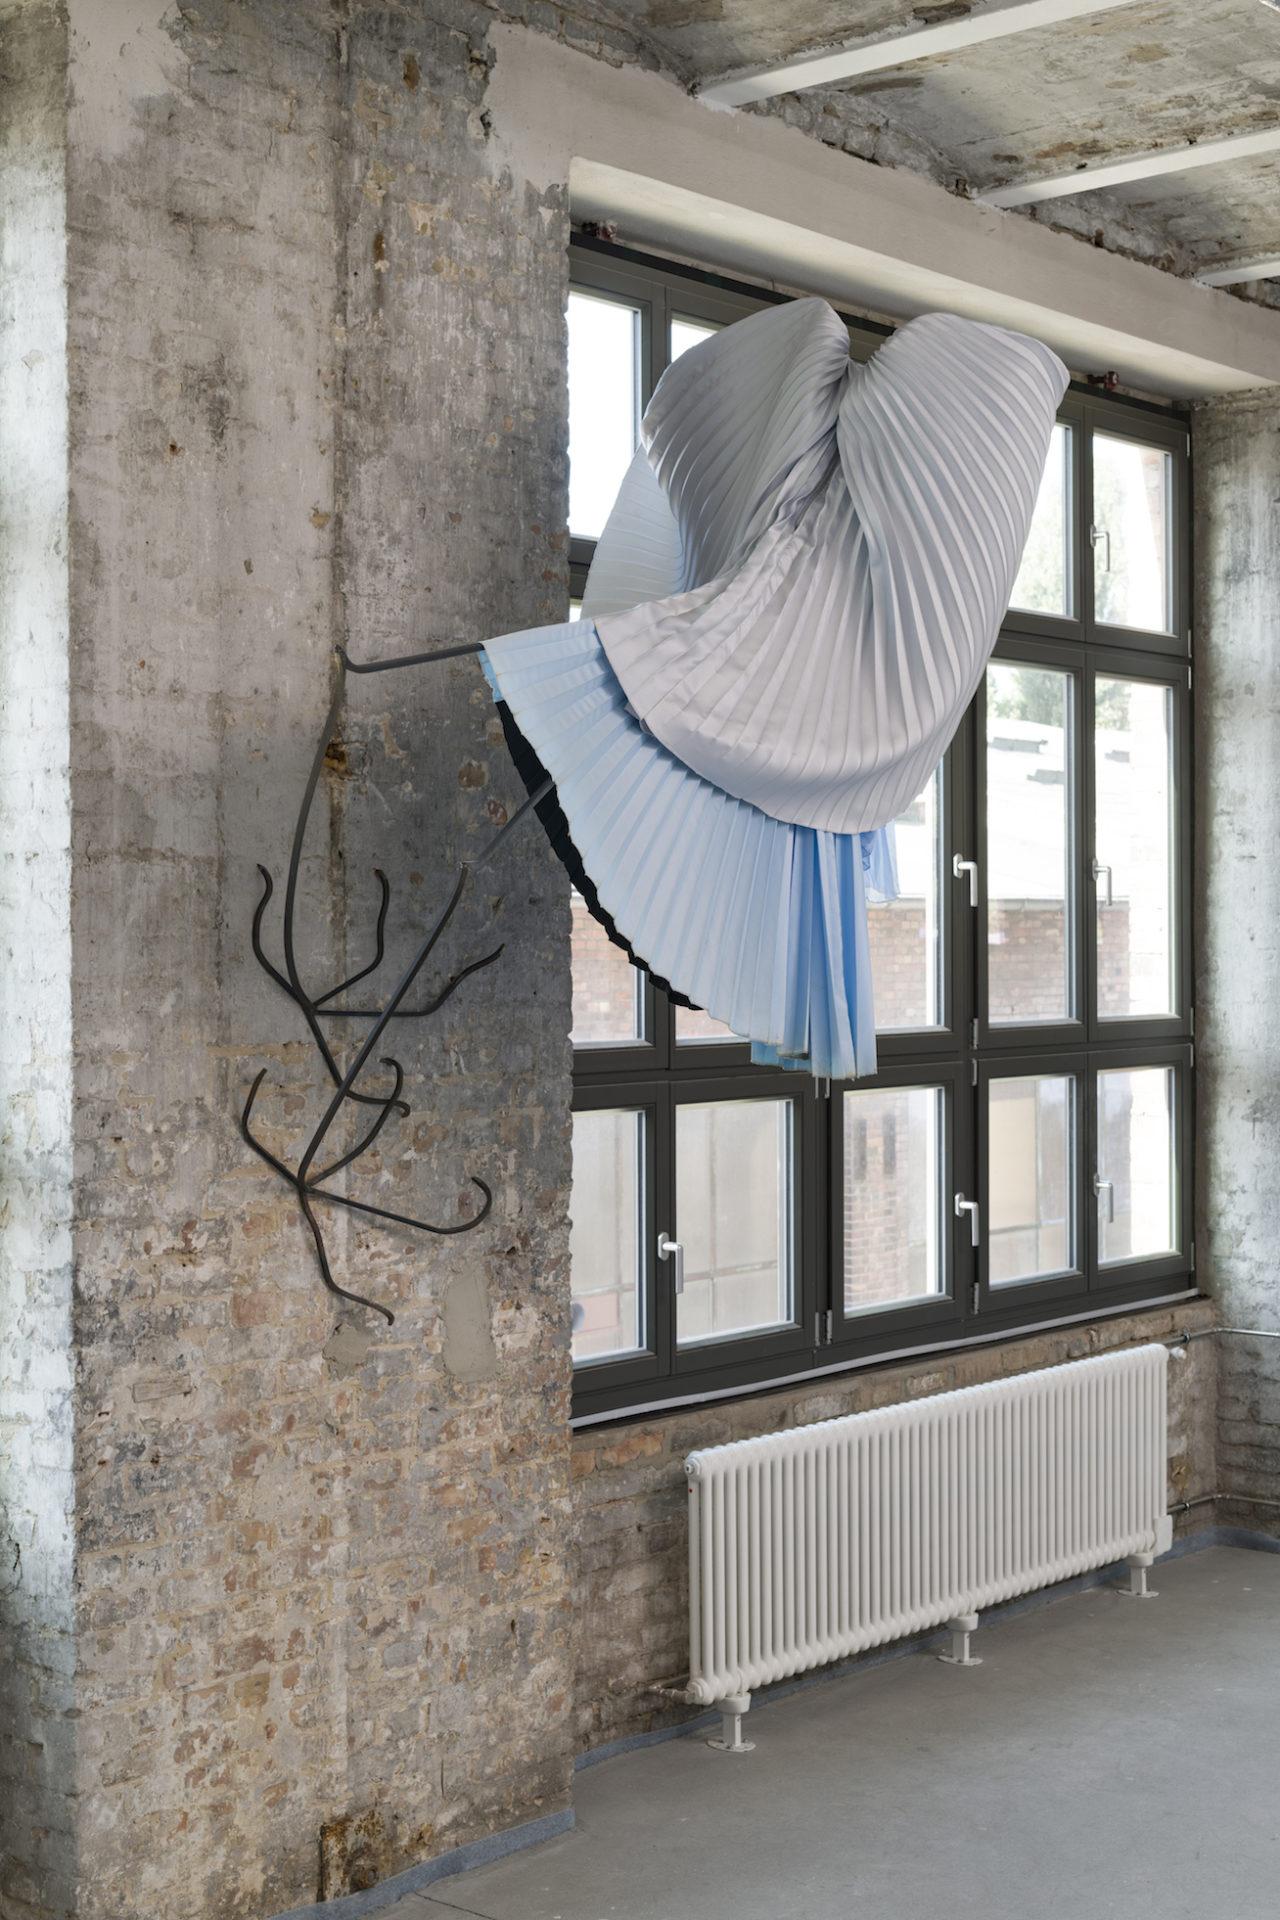 Petrit Halilaj, You used to fly... (Qëndresa), 02, 2018